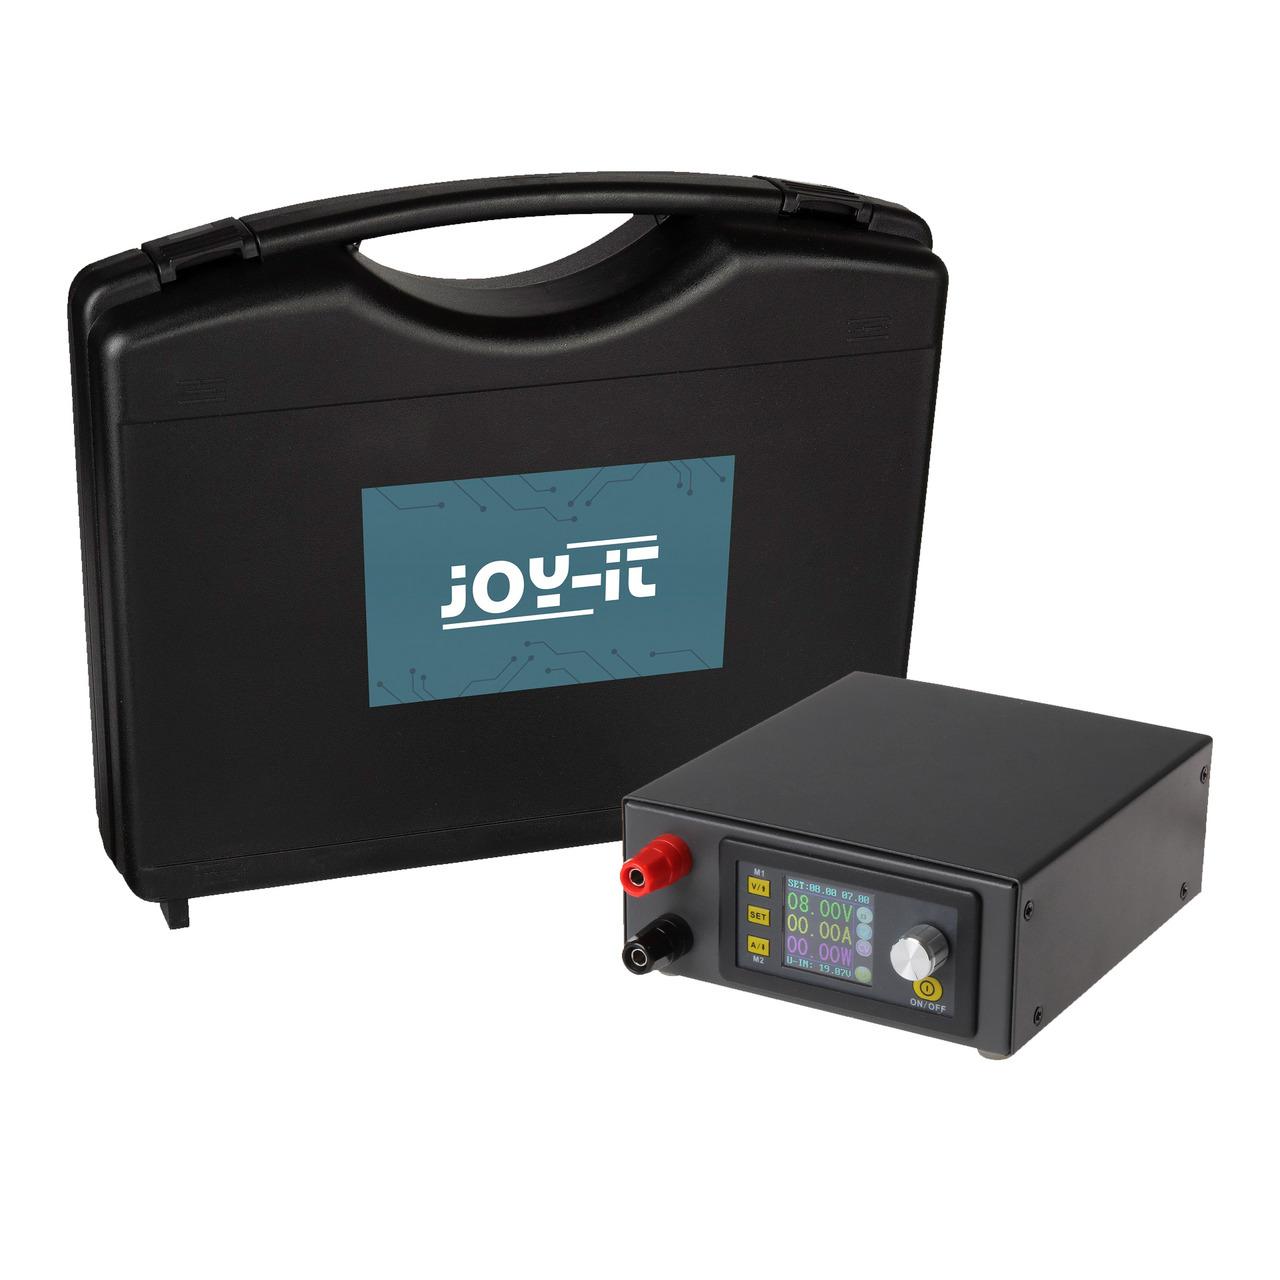 Joy-IT Step-up-Labornetzgerät JT-DPS5015 Set- inkl- Gehäuse und Zubehör- 0 - 50 V-0 - 15 A